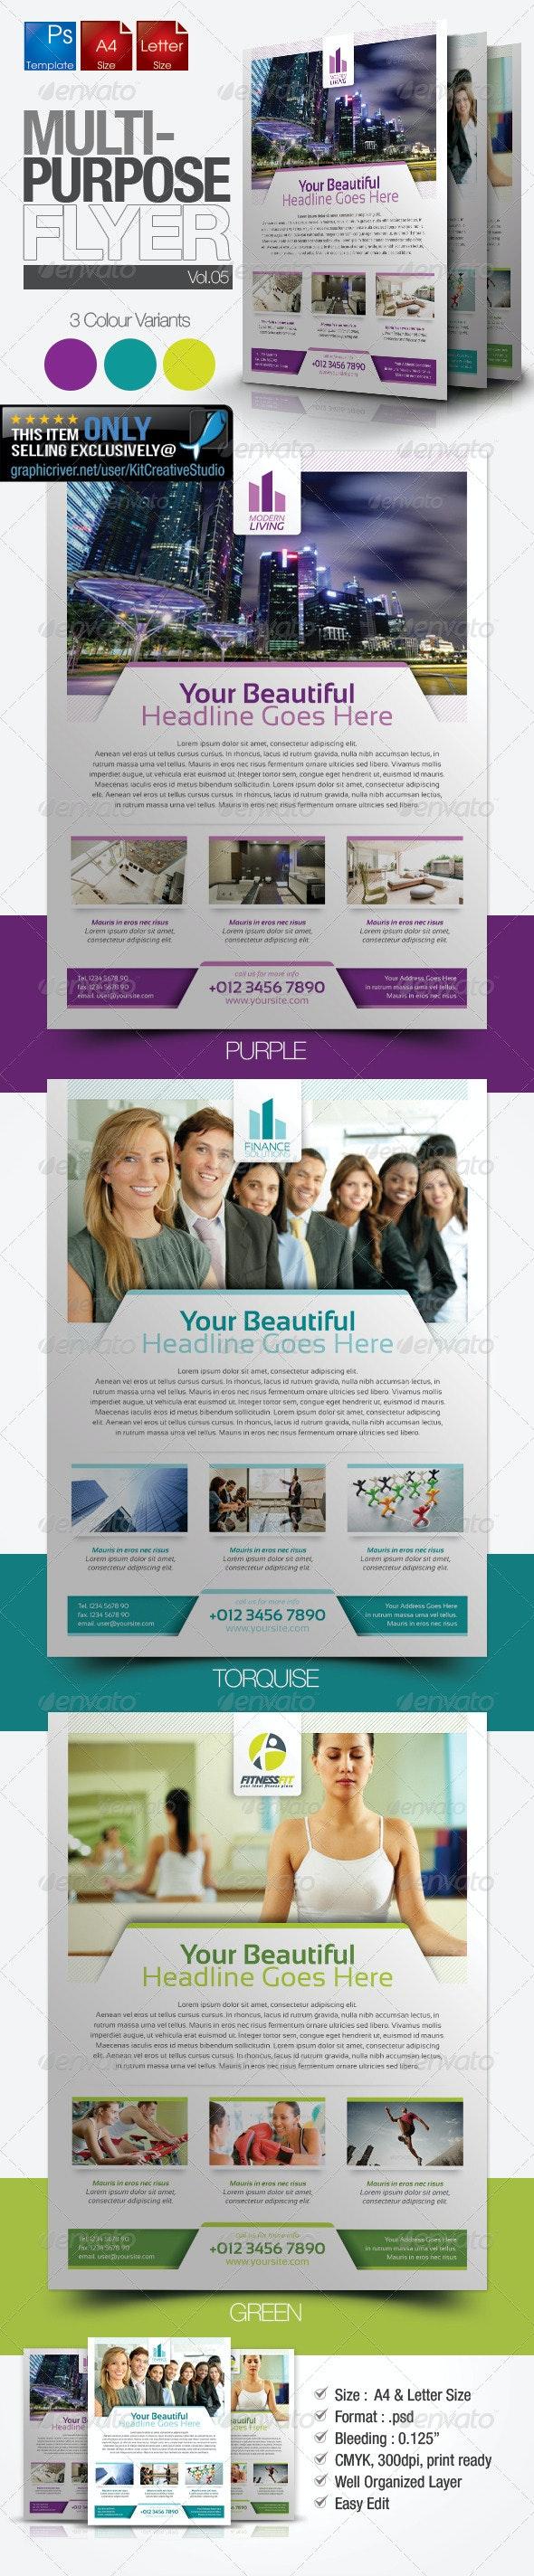 Multipurpose Business Flyer Vol.5 - Miscellaneous Events